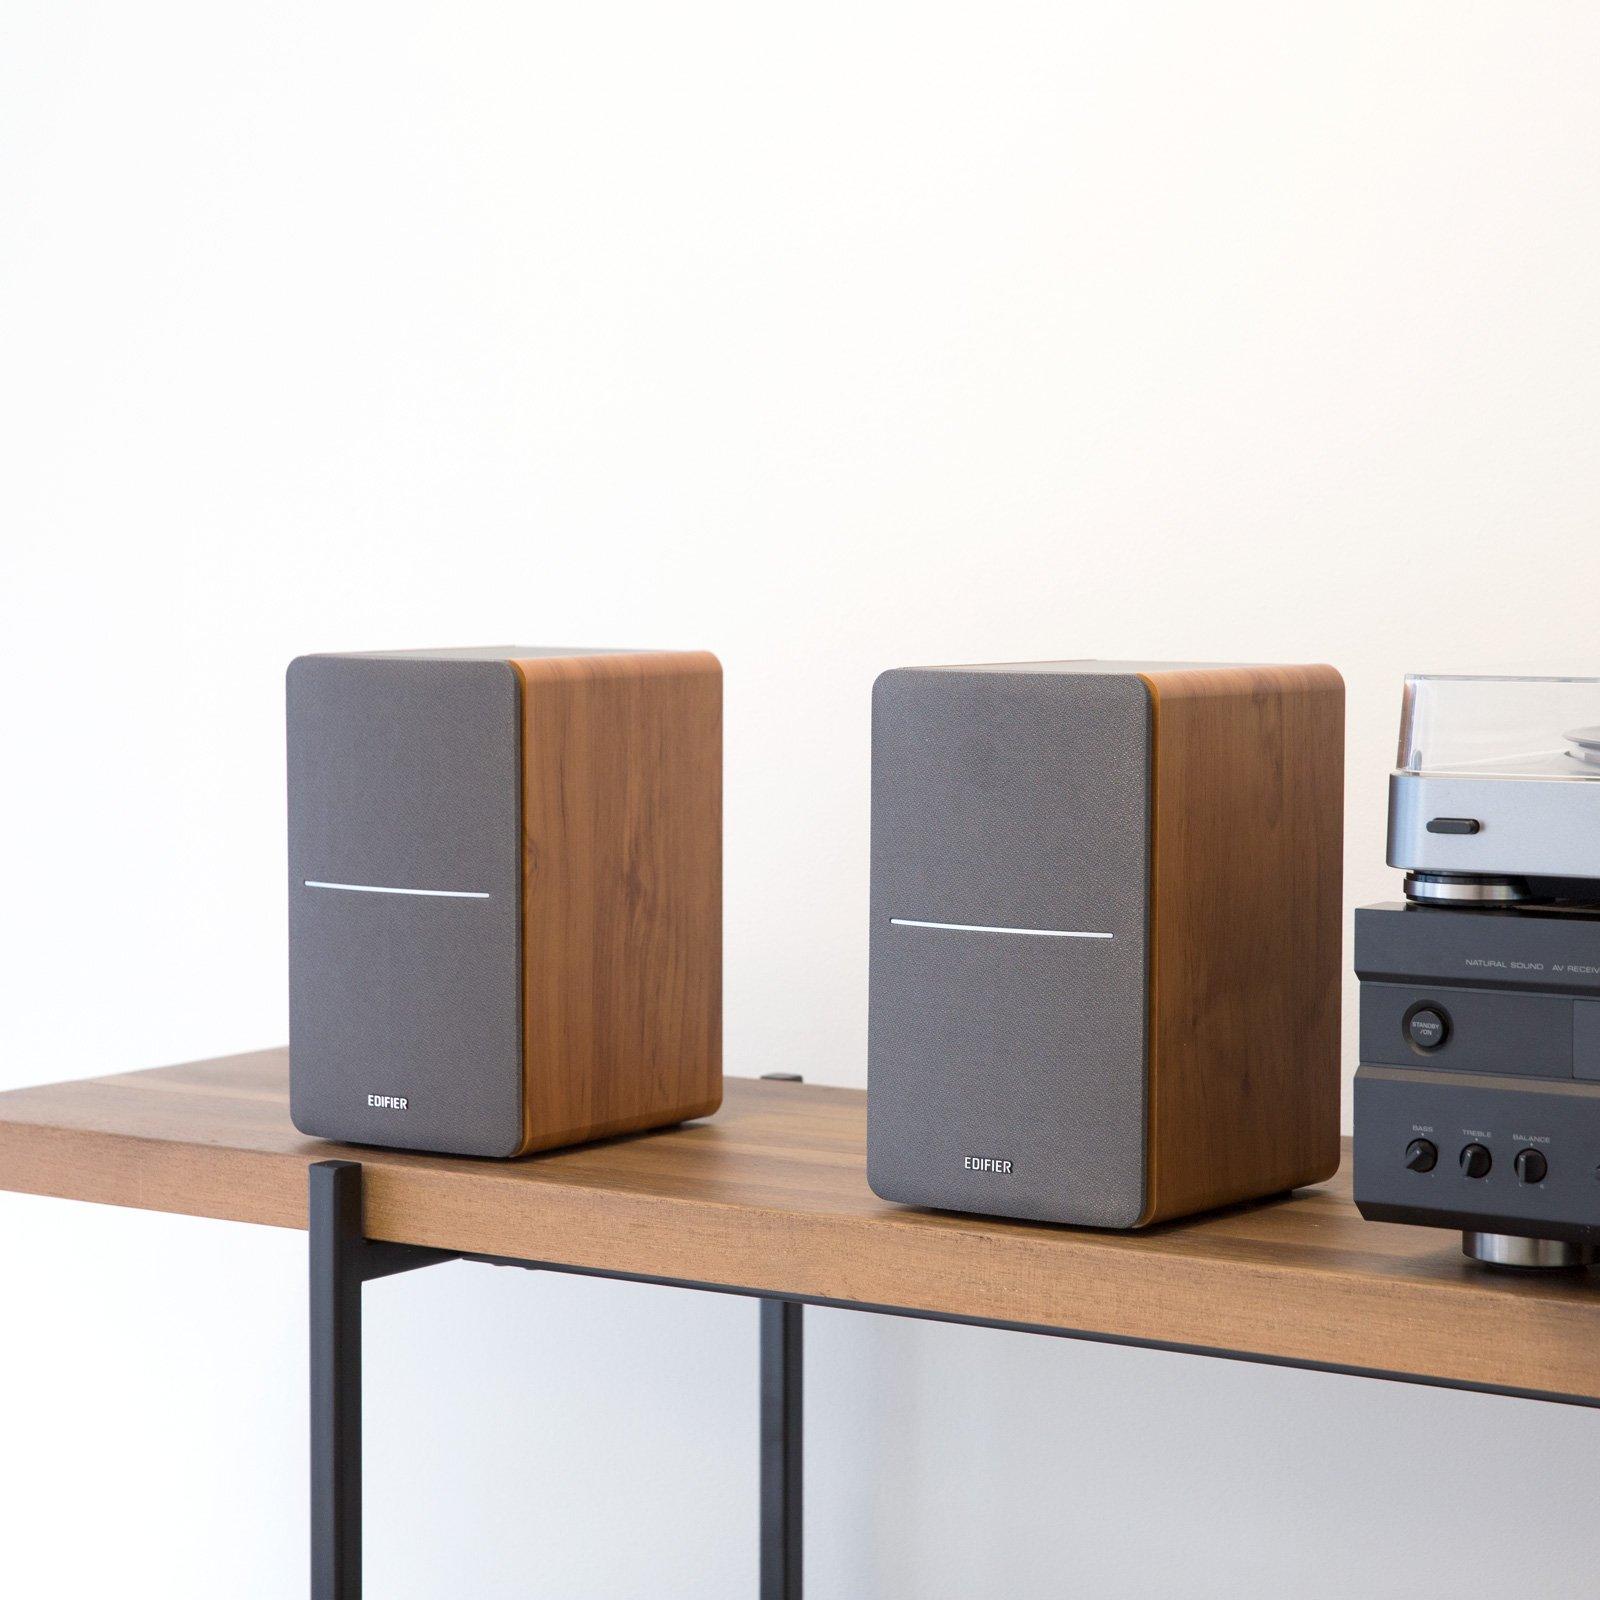 Edifier P12 Passive Bookshelf Speakers - 2-Way Speakers with Built-in Wall-Mount Bracket - Wood Color, Pair by Edifier (Image #7)